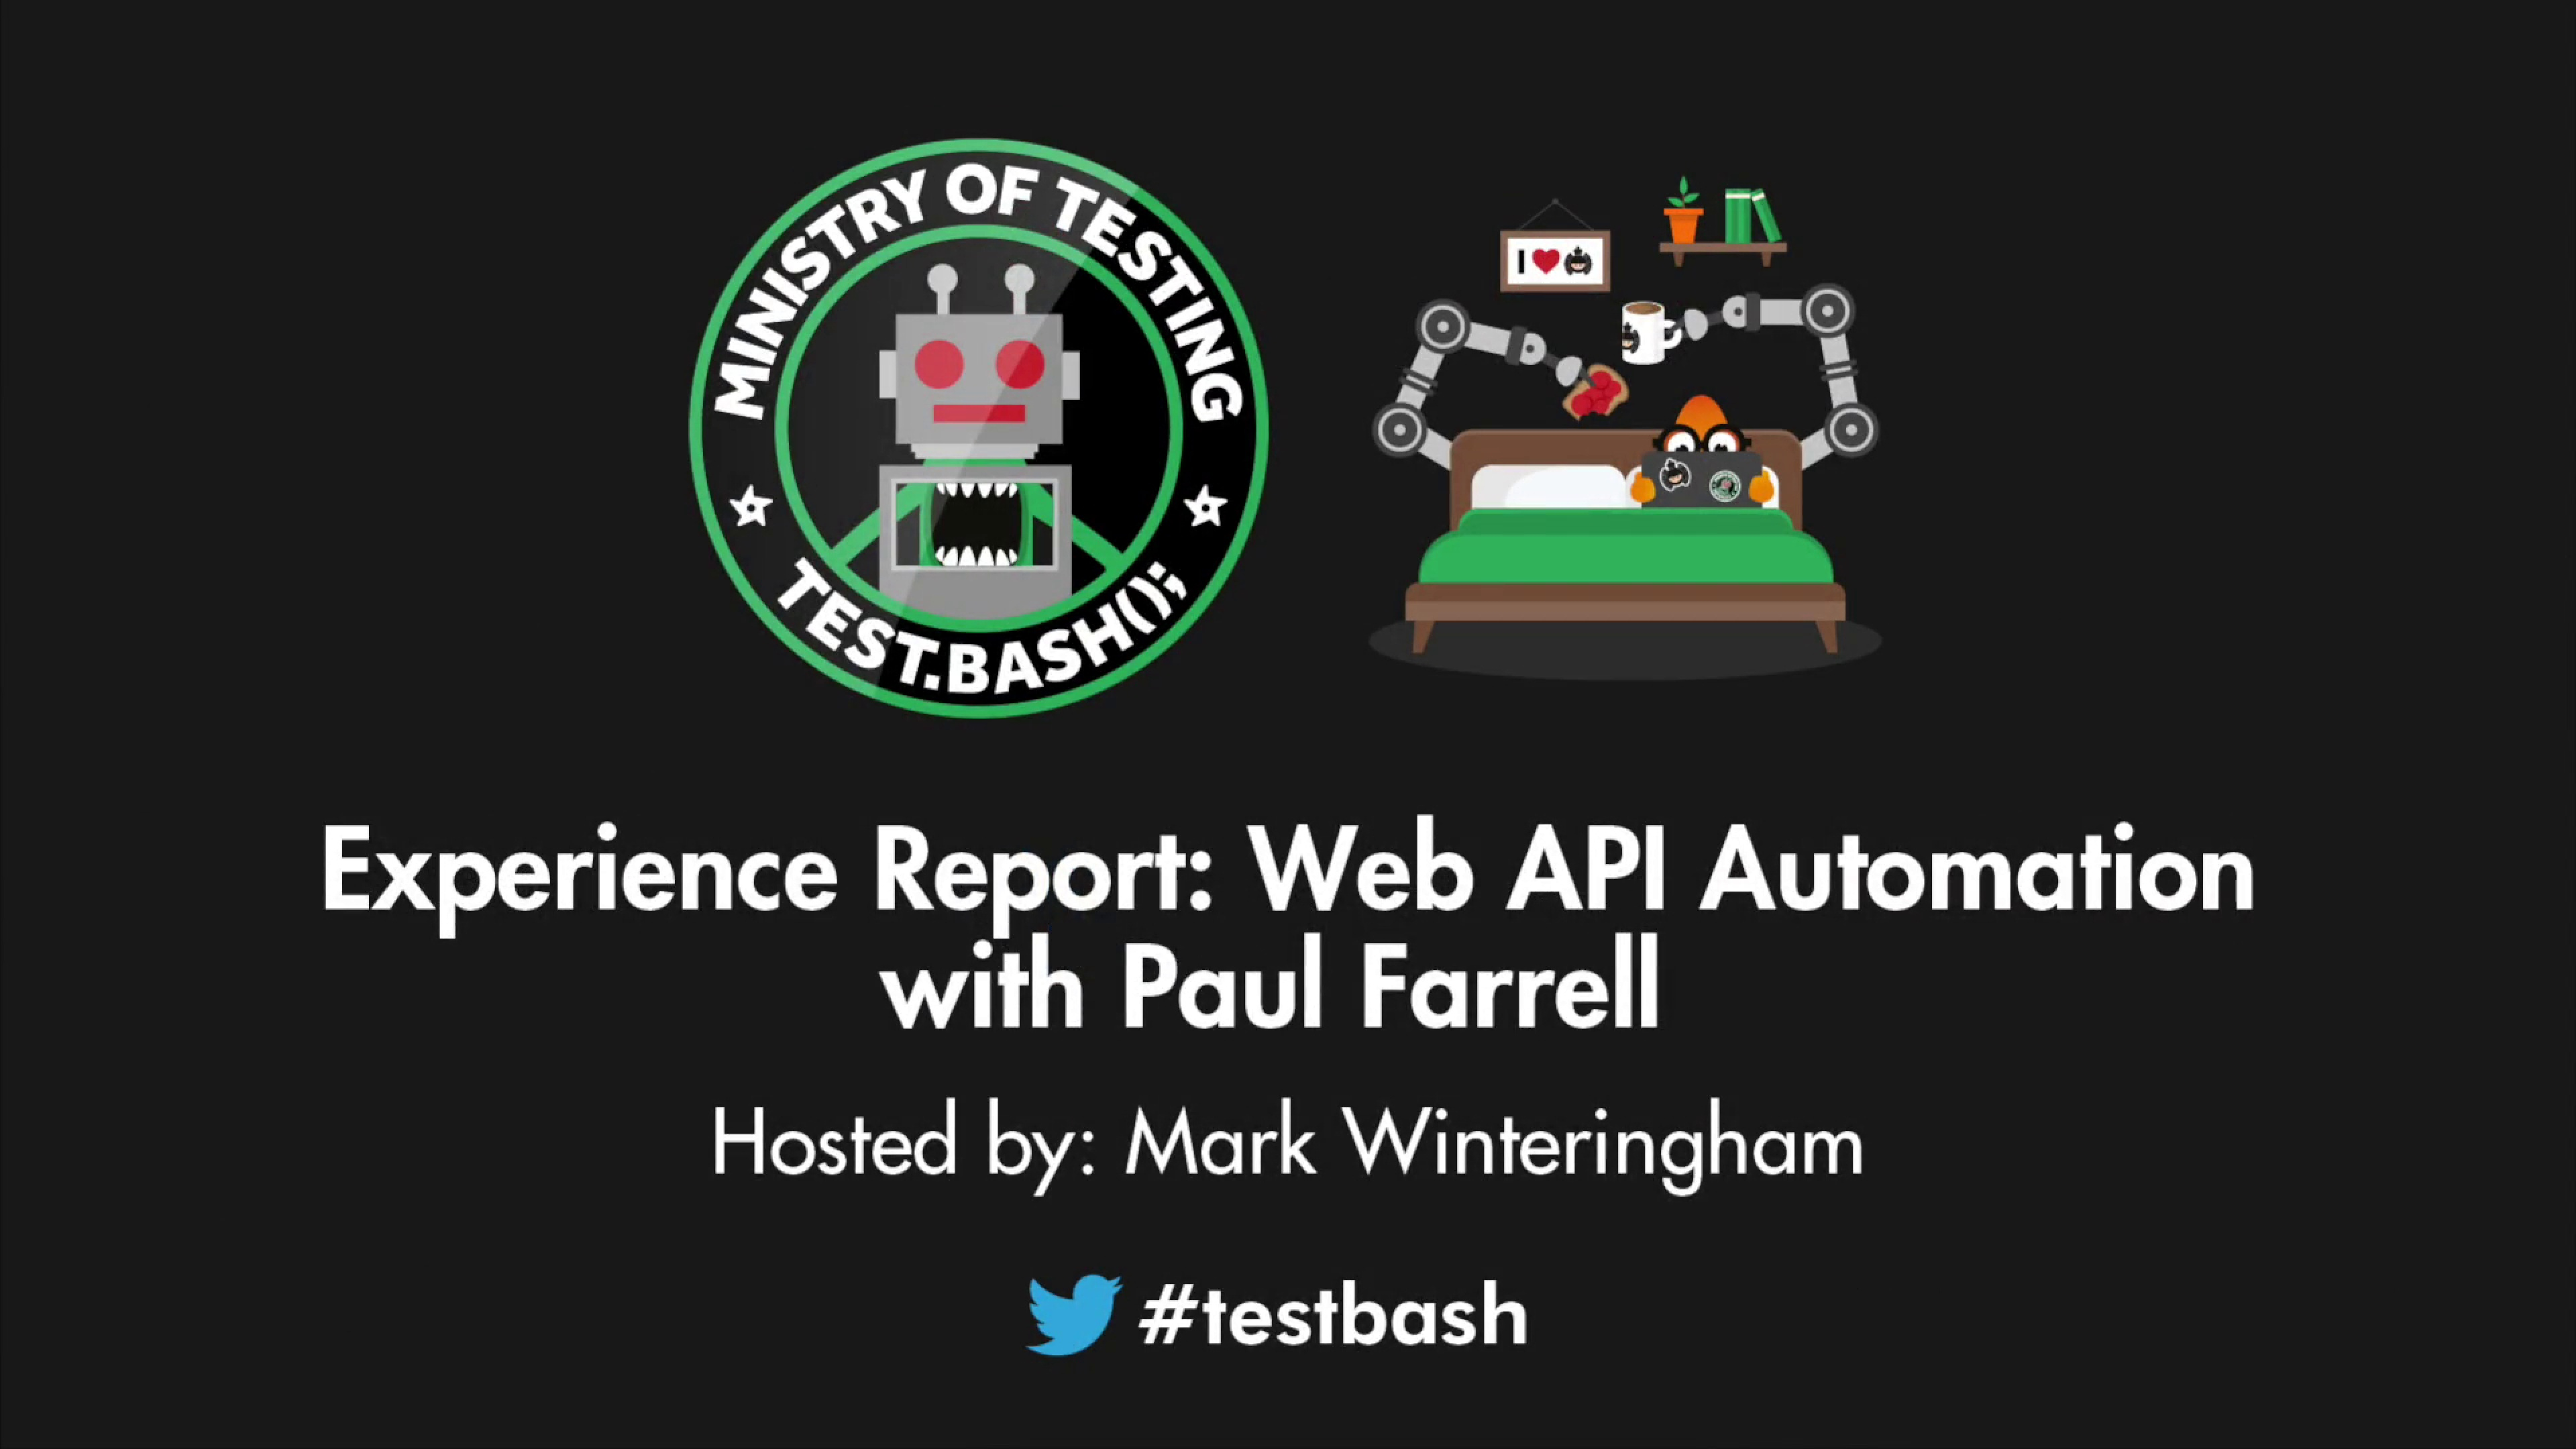 Experience Report: Web API Automation - Paul Farrell